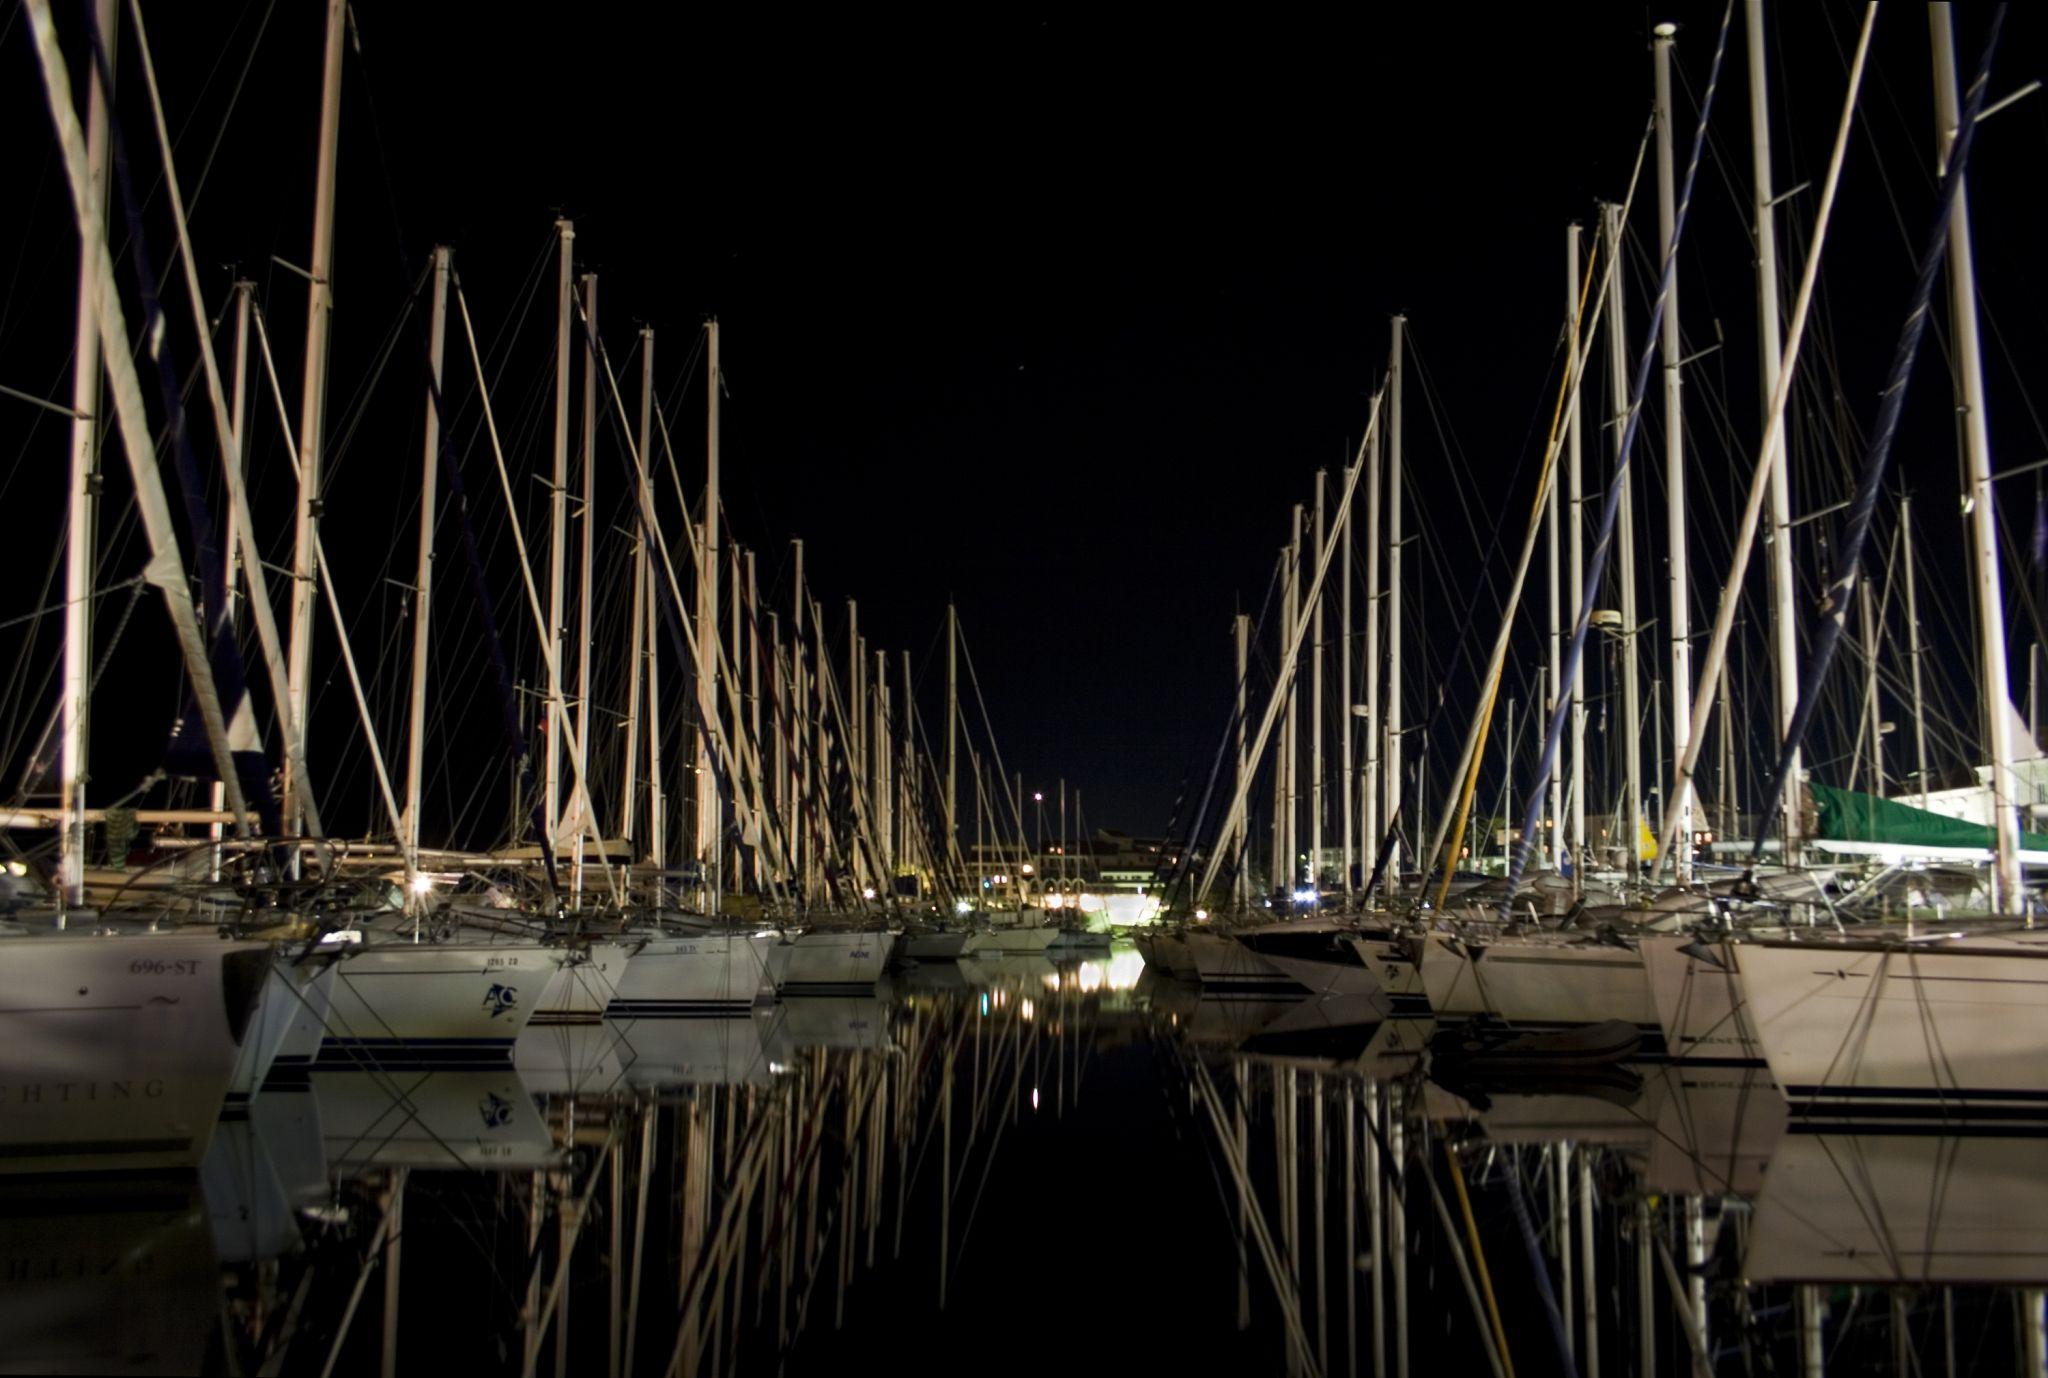 Korcula yacht port, Croatia